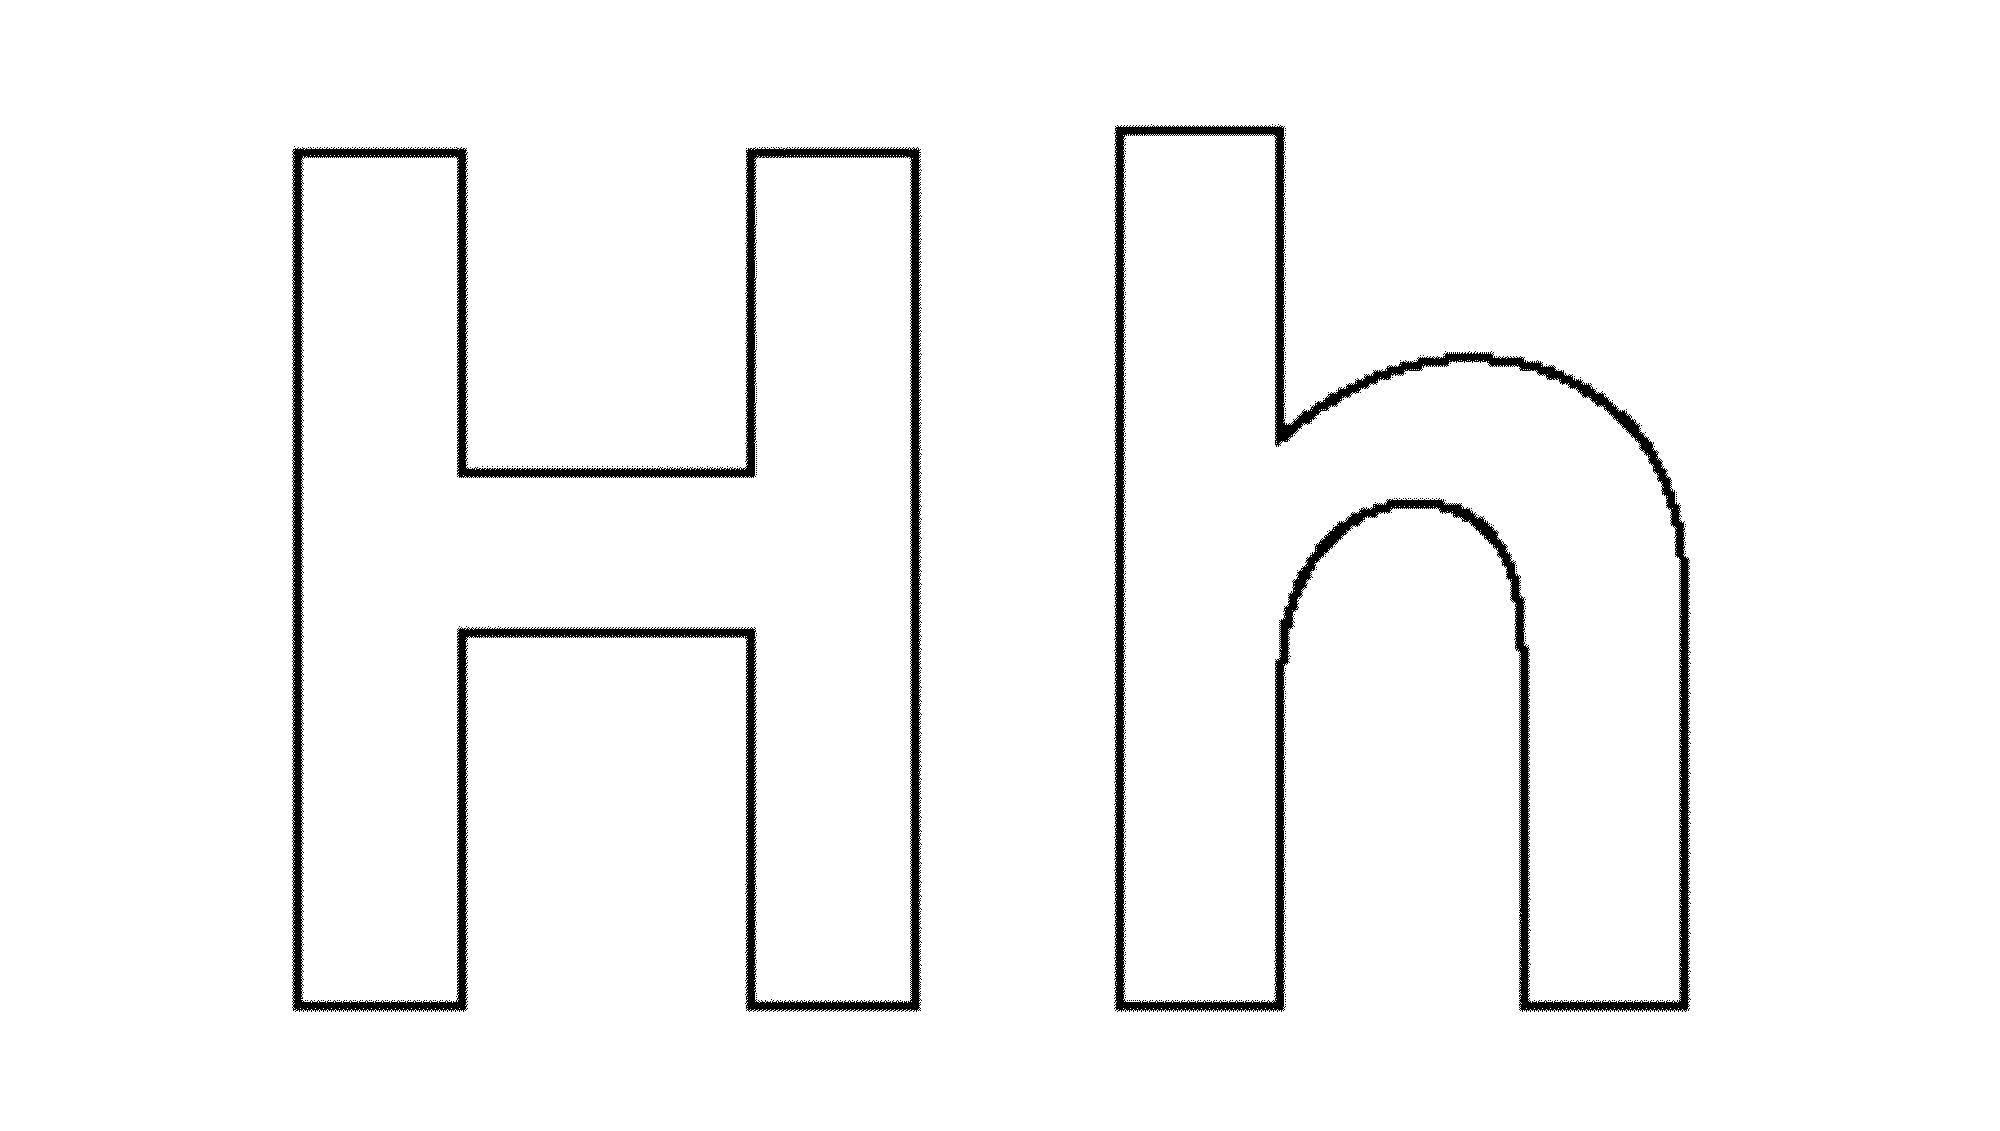 letter-h-coloring-pages-alphabet | Alphabet coloring pages